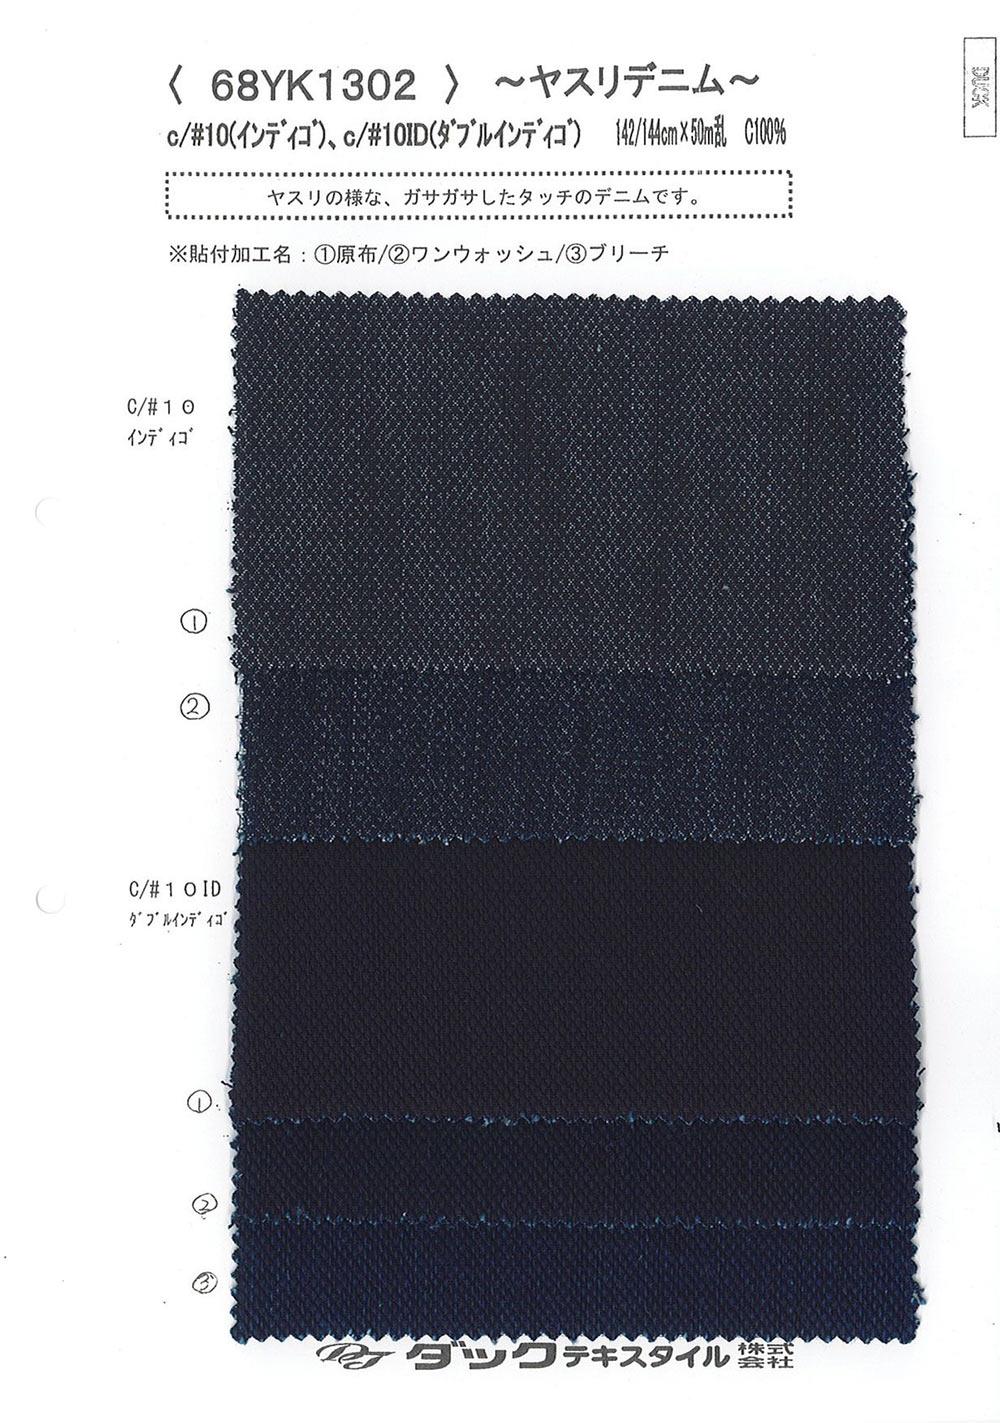 68YK1302 ヤスリデニム[生地] ダックテキスタイル/オークラ商事 - ApparelX アパレル資材卸通販